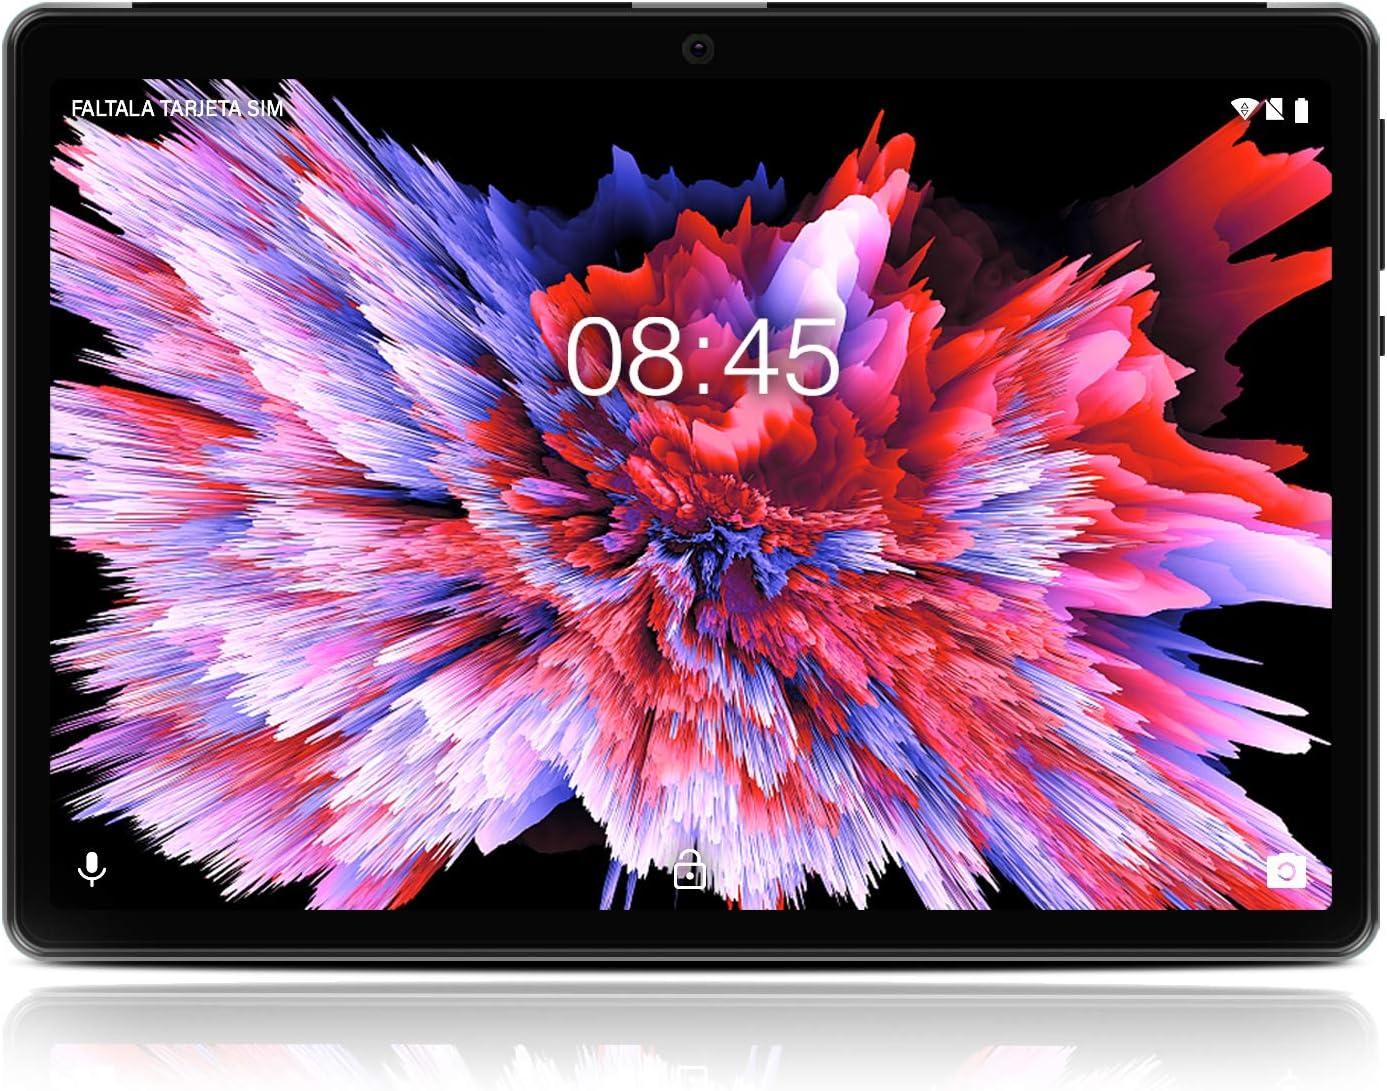 Tablet 10 Pulgadas Android 10.0 - MEBERRY Ultrar-Rápido Tableta 4GB RAM+64GB ROM - Certificación Google gsm - Dual SIM - 8000mAh |WI-FI|Bluetooth|GPS| Type-C Tablet (5.0+8.0 MP Cámara) -Gris